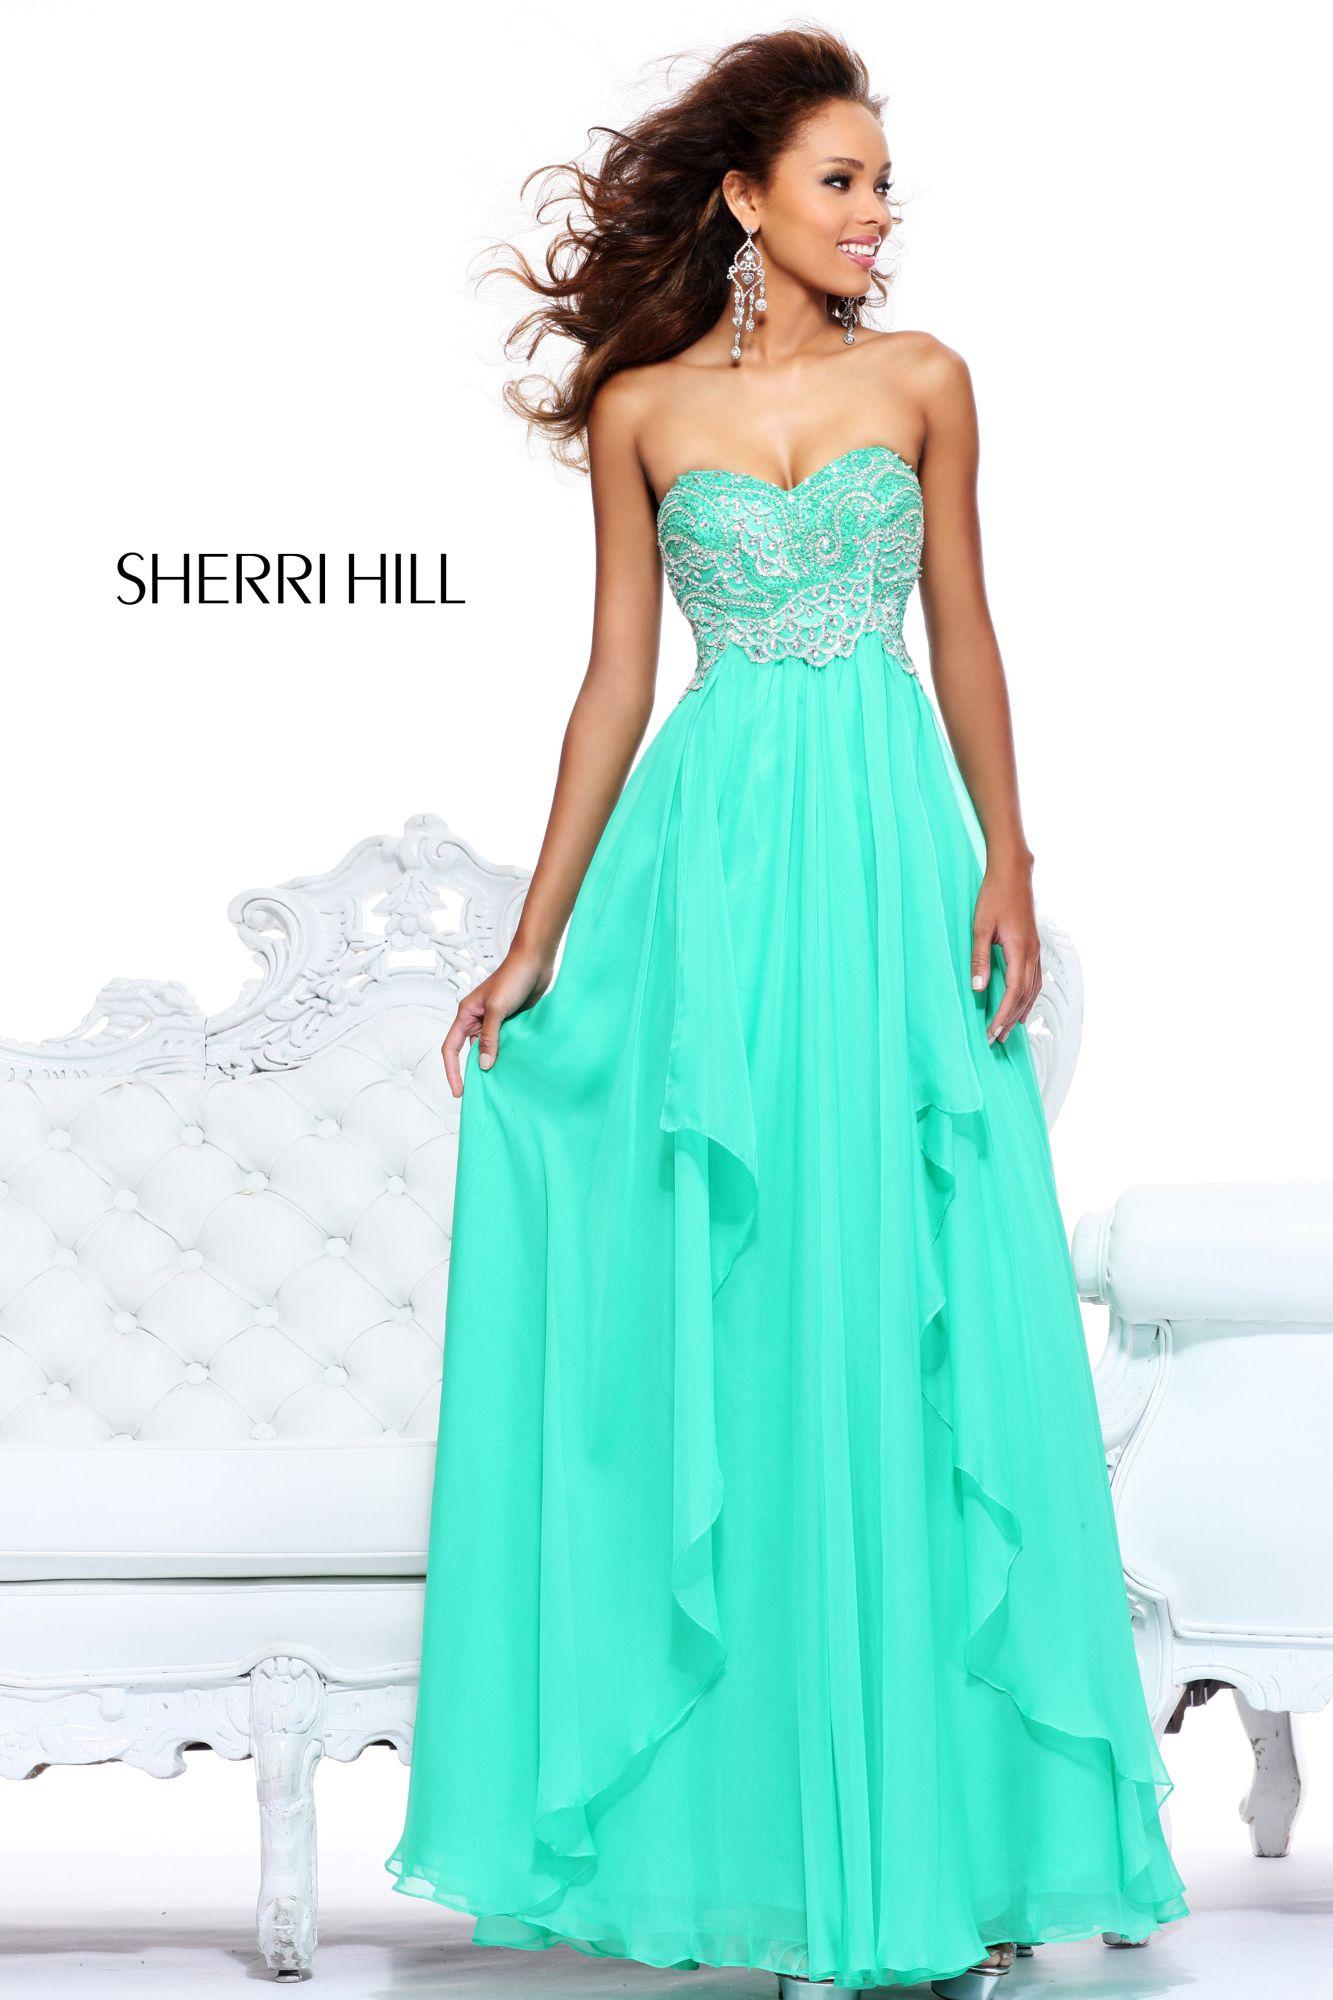 2013 Sherri Hill 3874 Green Homecoming Dresses | Sherri Hill Dresses ...